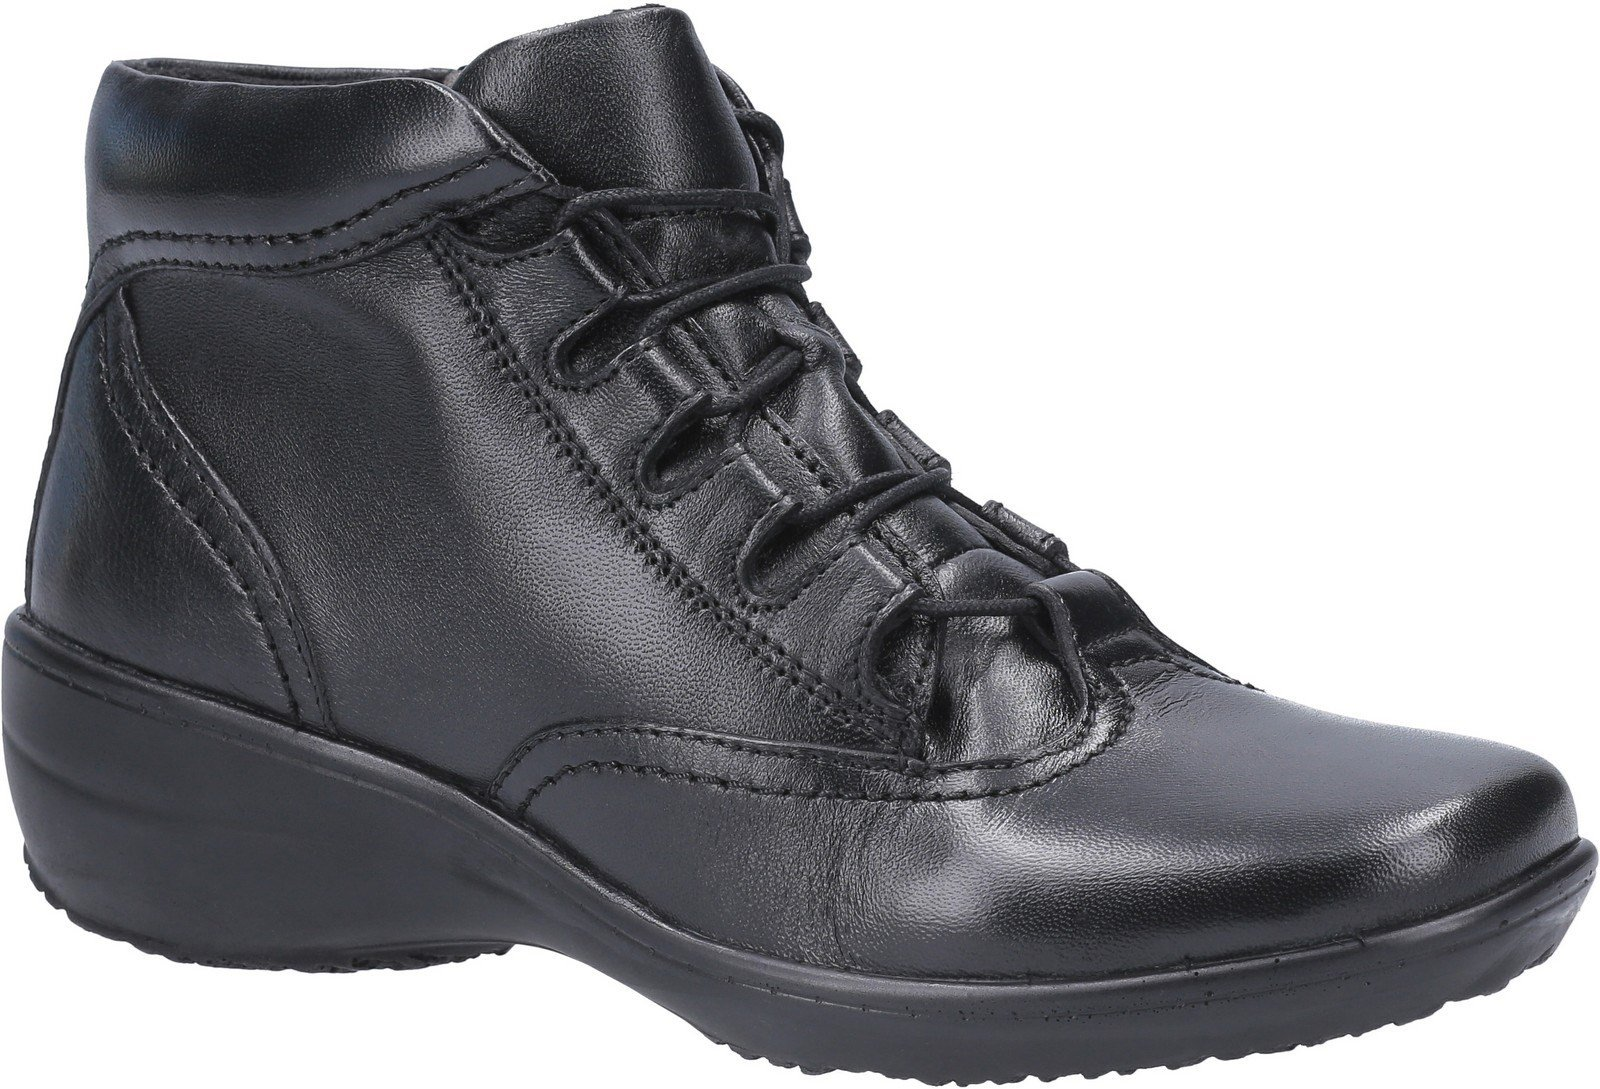 Fleet & Foster Women's Merle Lace Up Ankle Boot Black 29295-49581 - Black 3